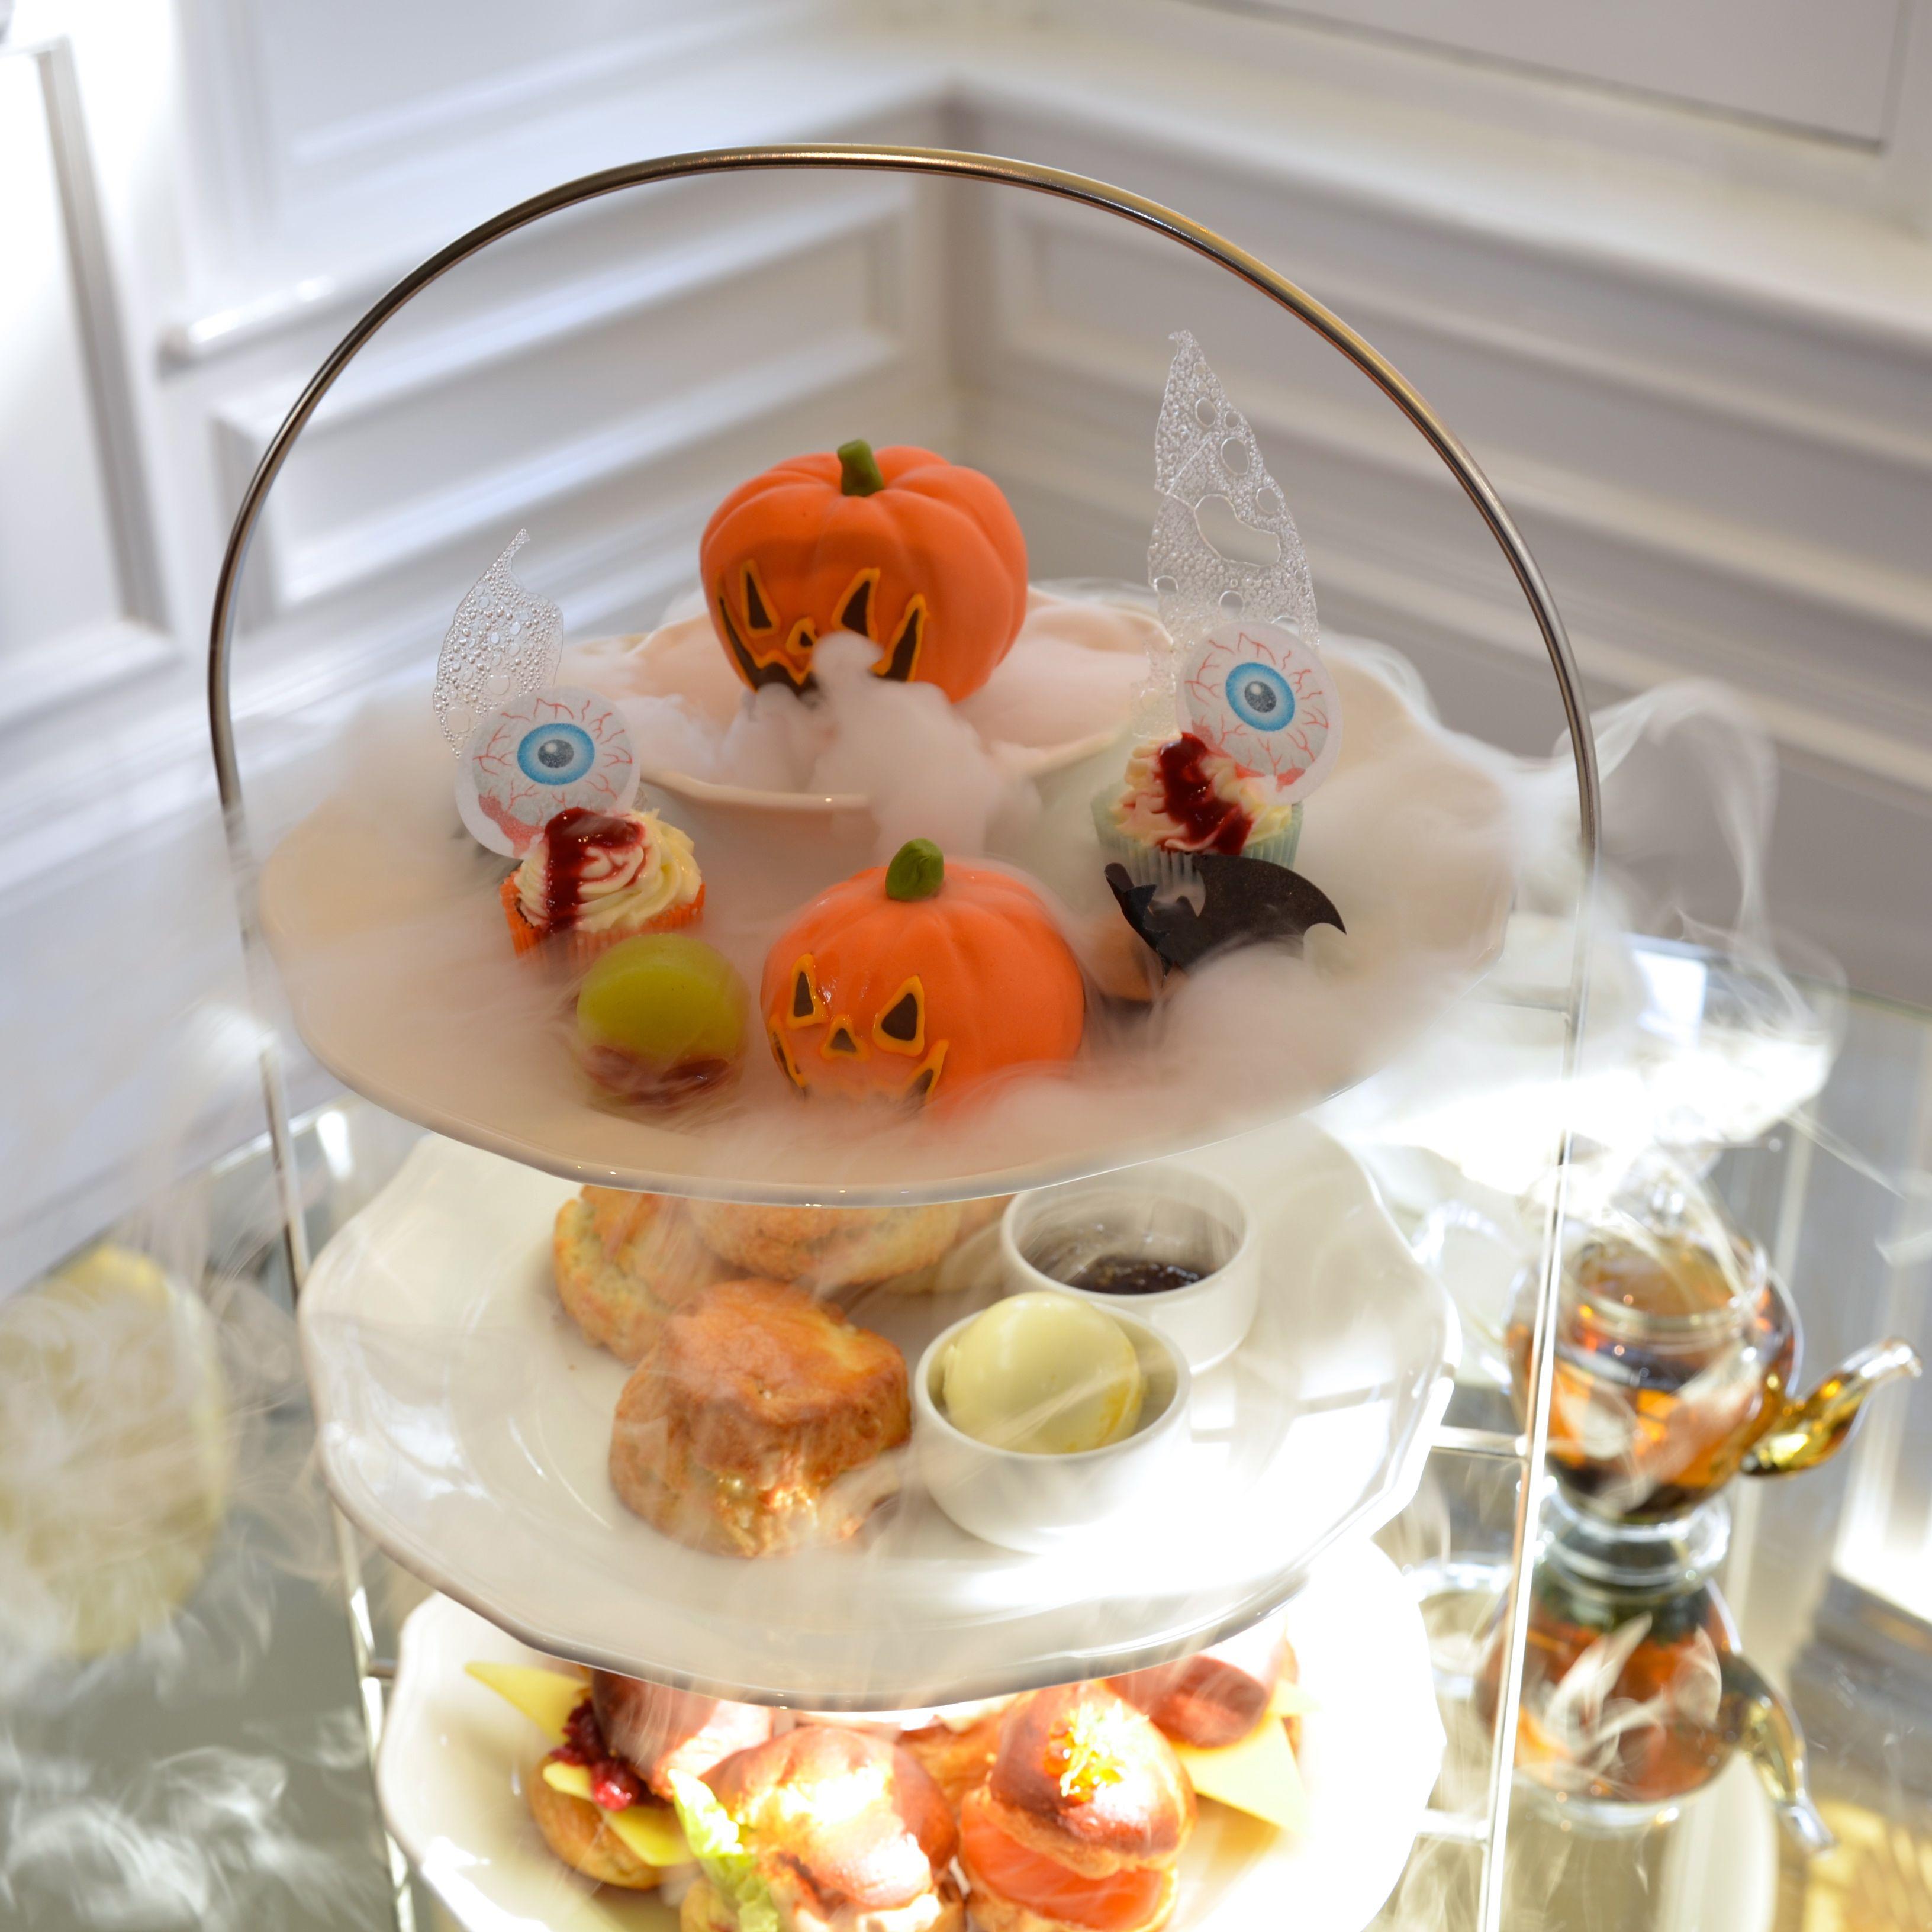 Halloween Afternoon Tea At The Ampersand Hotel, Kensington